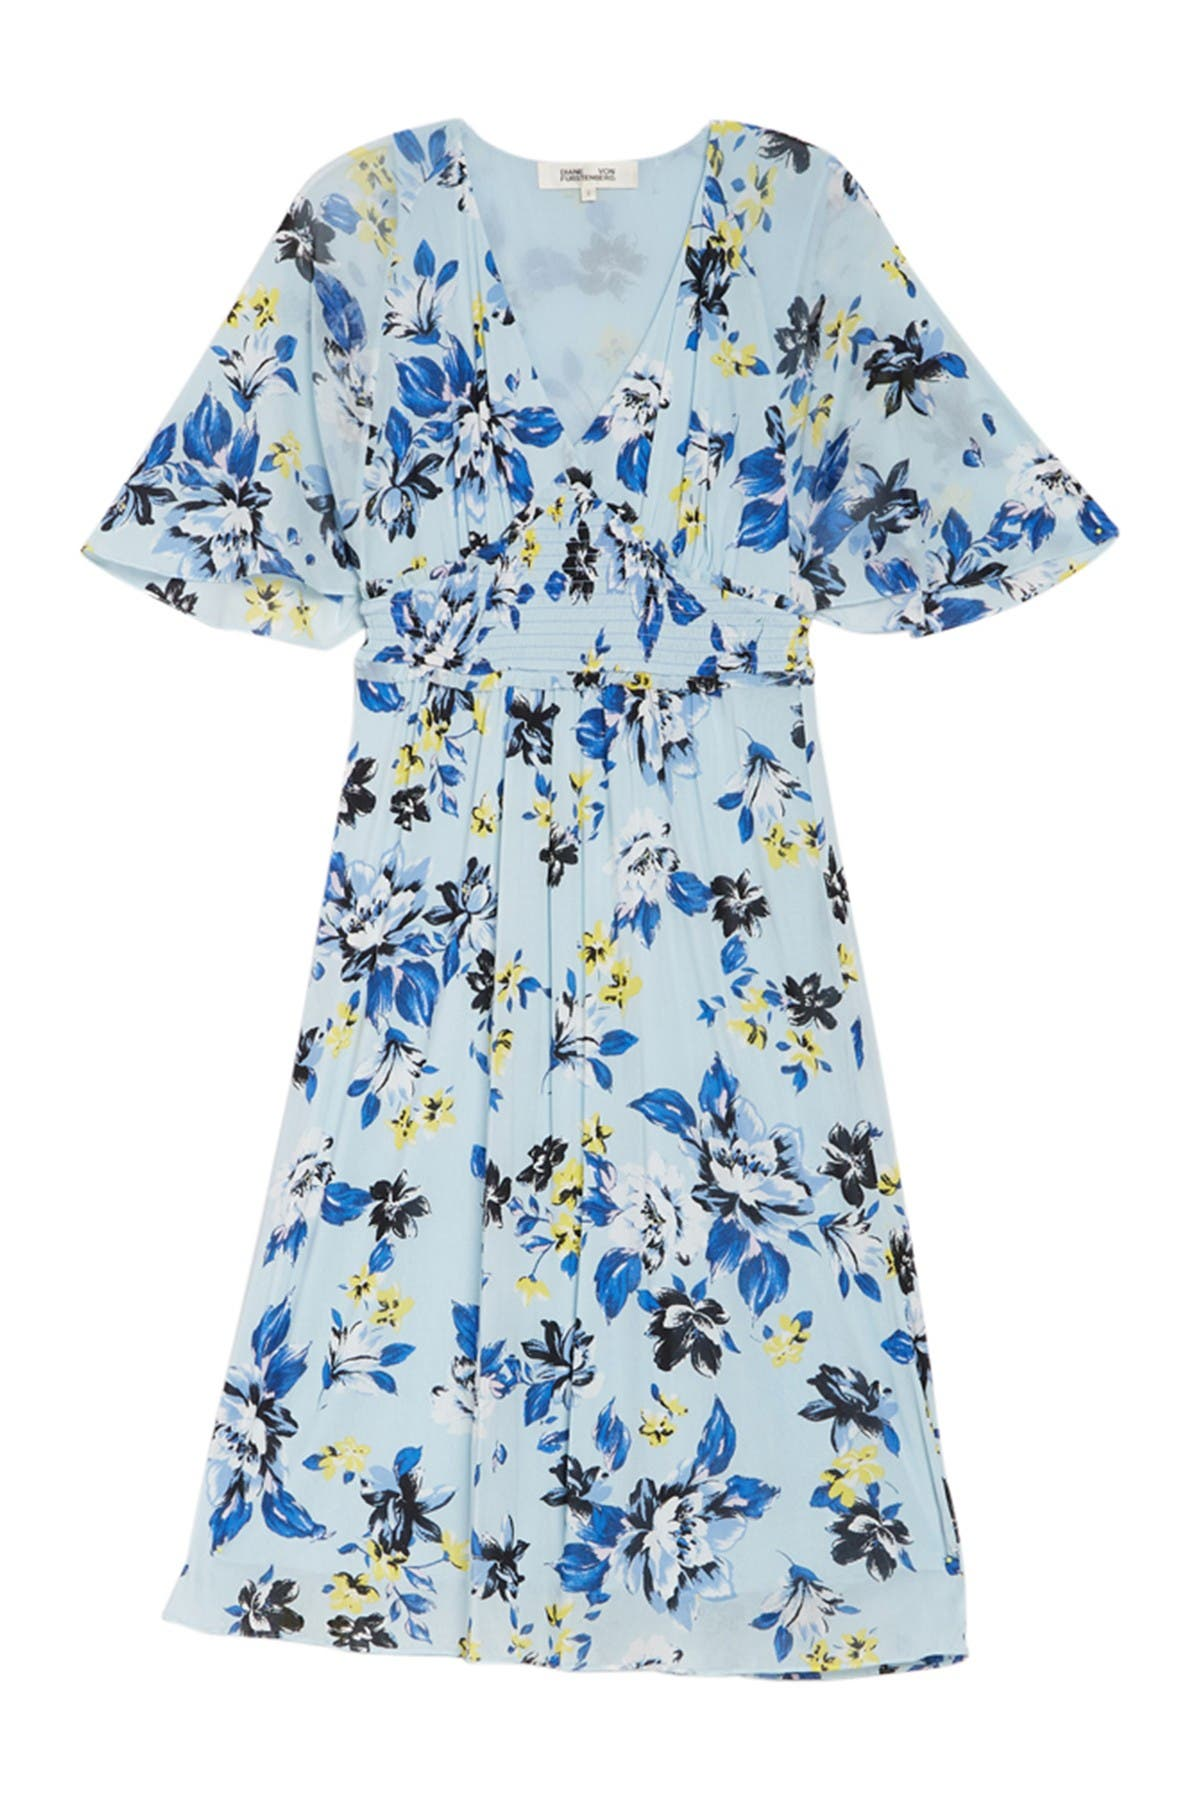 Image of Diane von Furstenberg Nala Floral Smocked Midi Dress